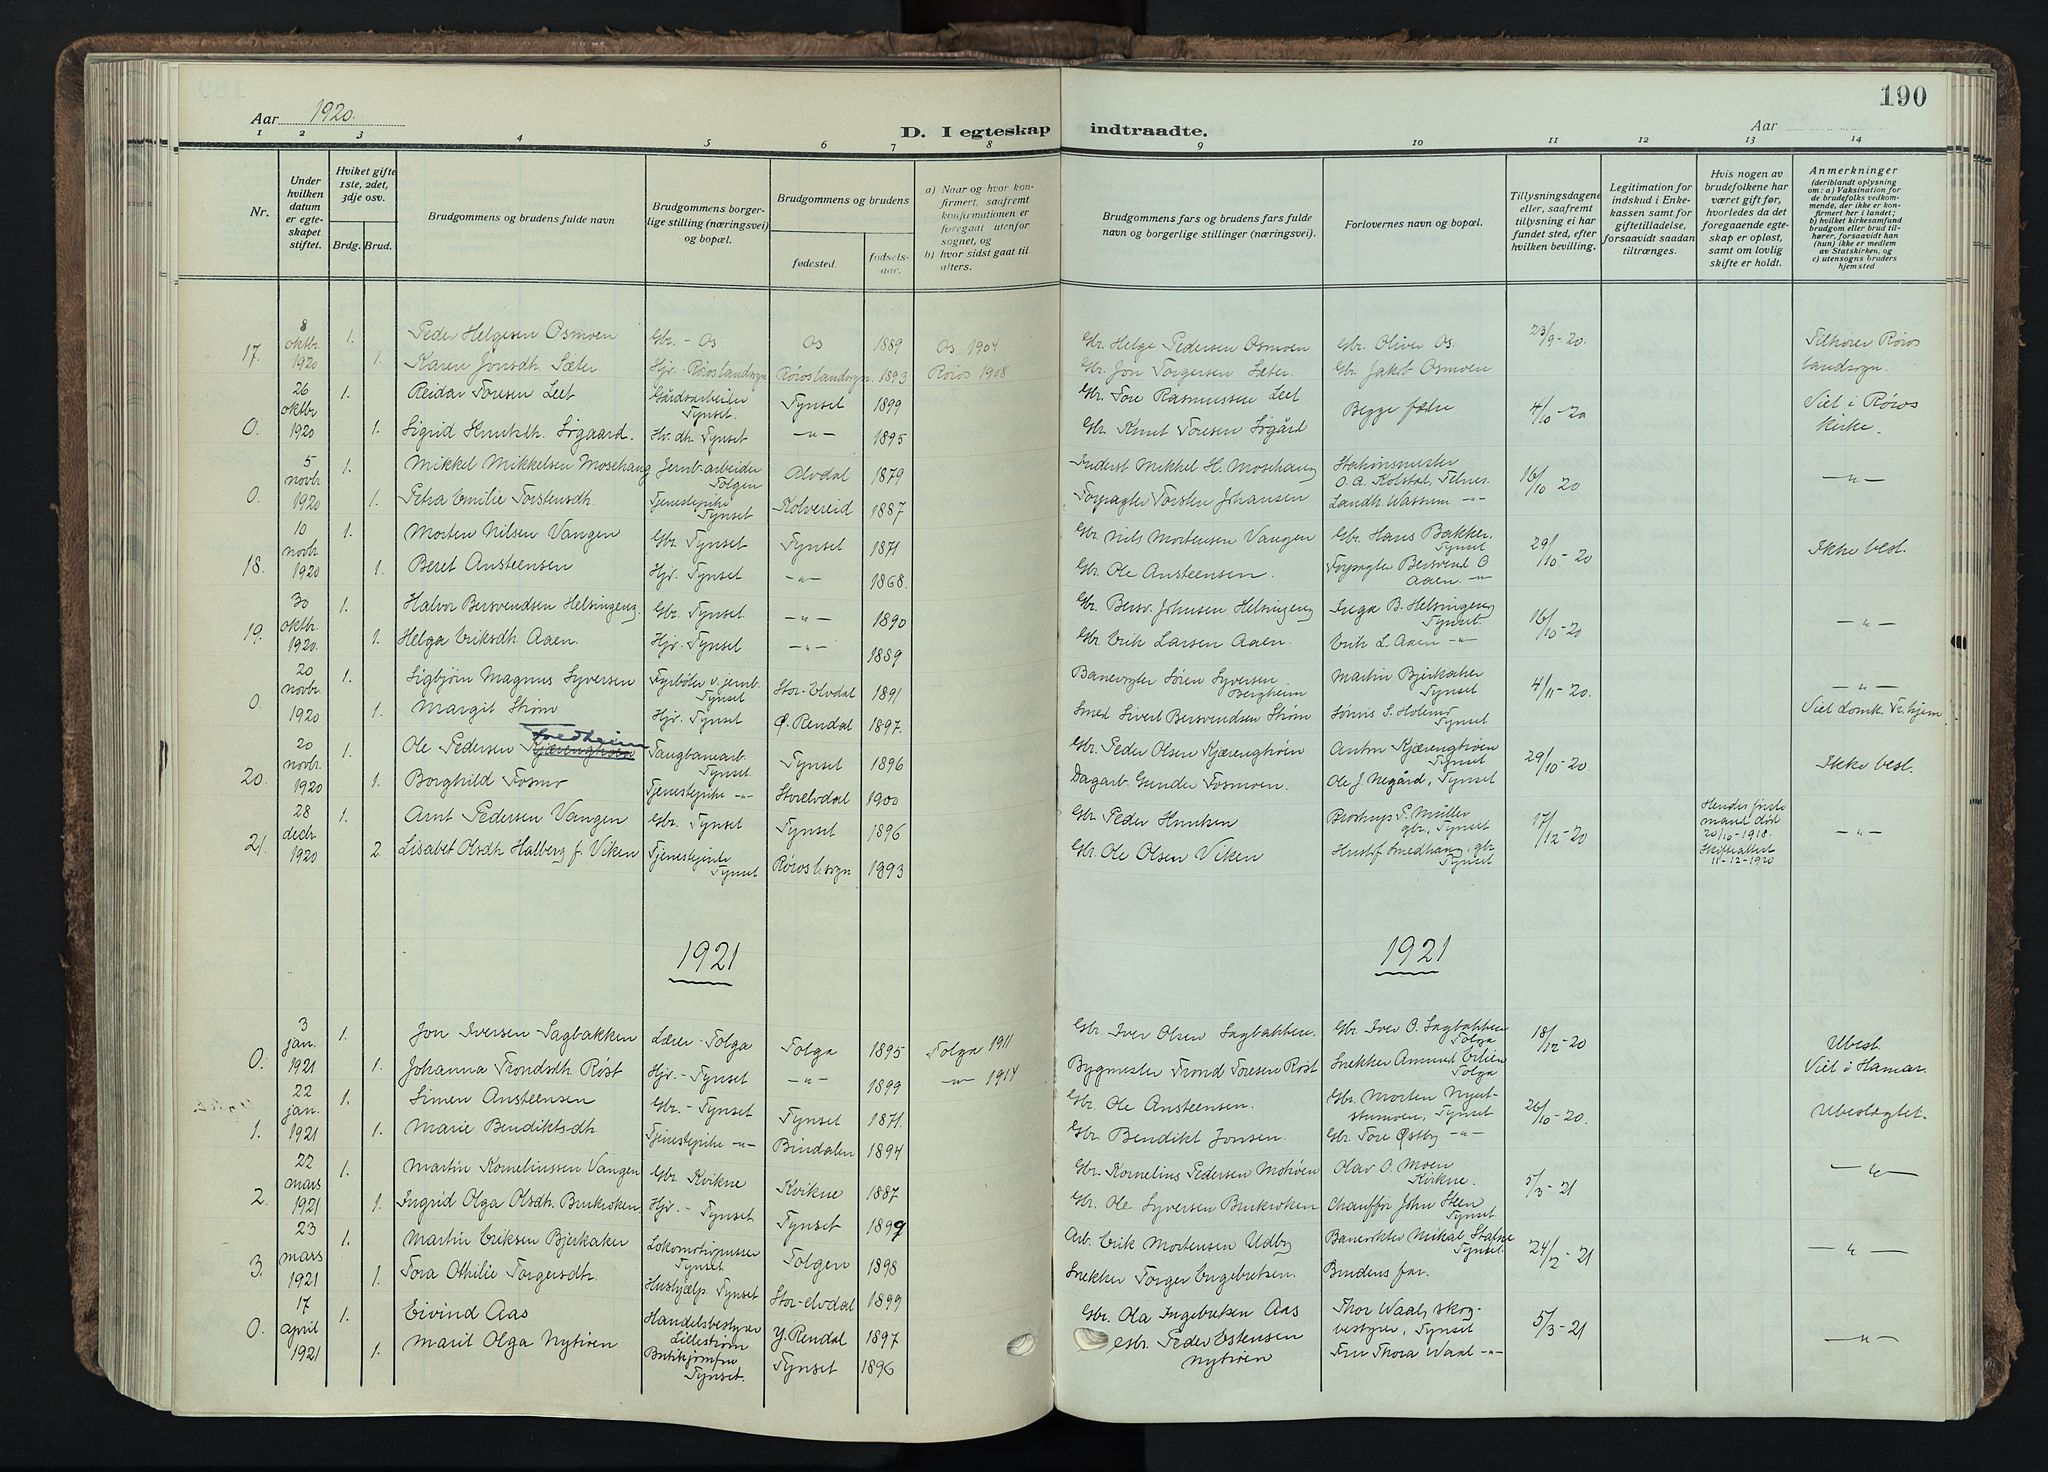 SAH, Tynset prestekontor, Ministerialbok nr. 26, 1915-1929, s. 190